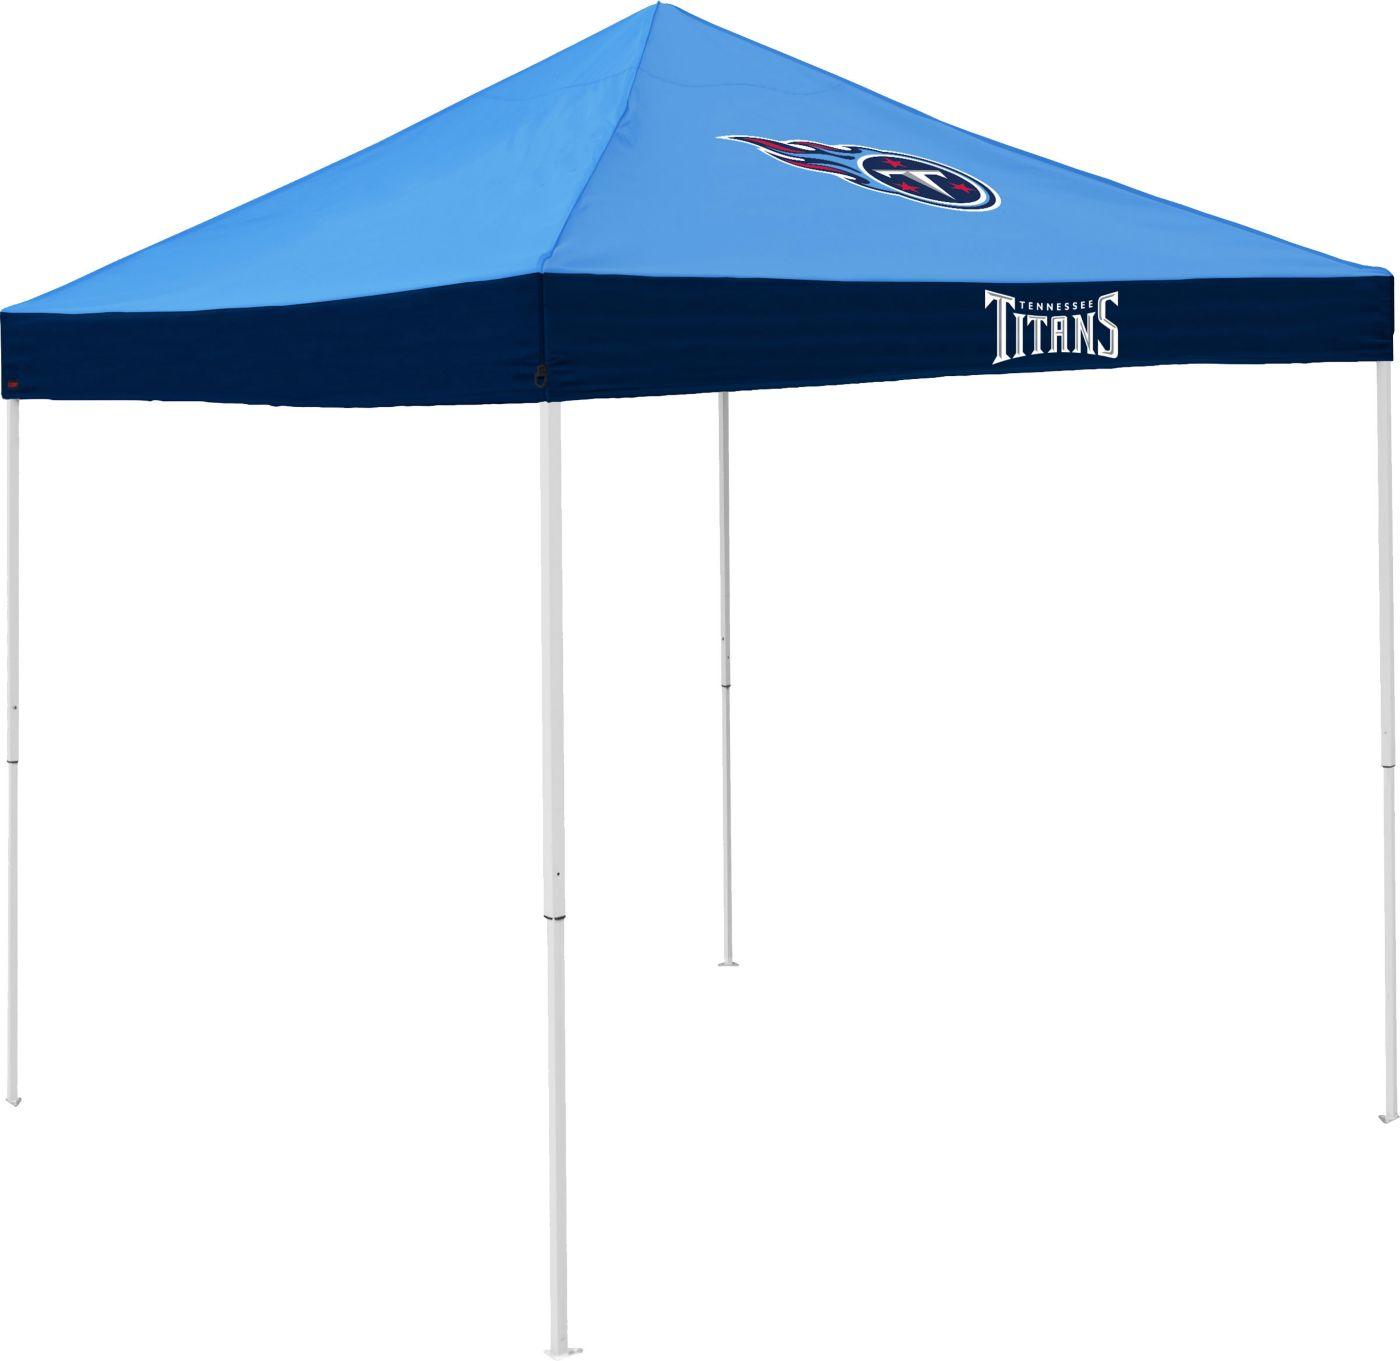 Tennessee Titans Economy Tent